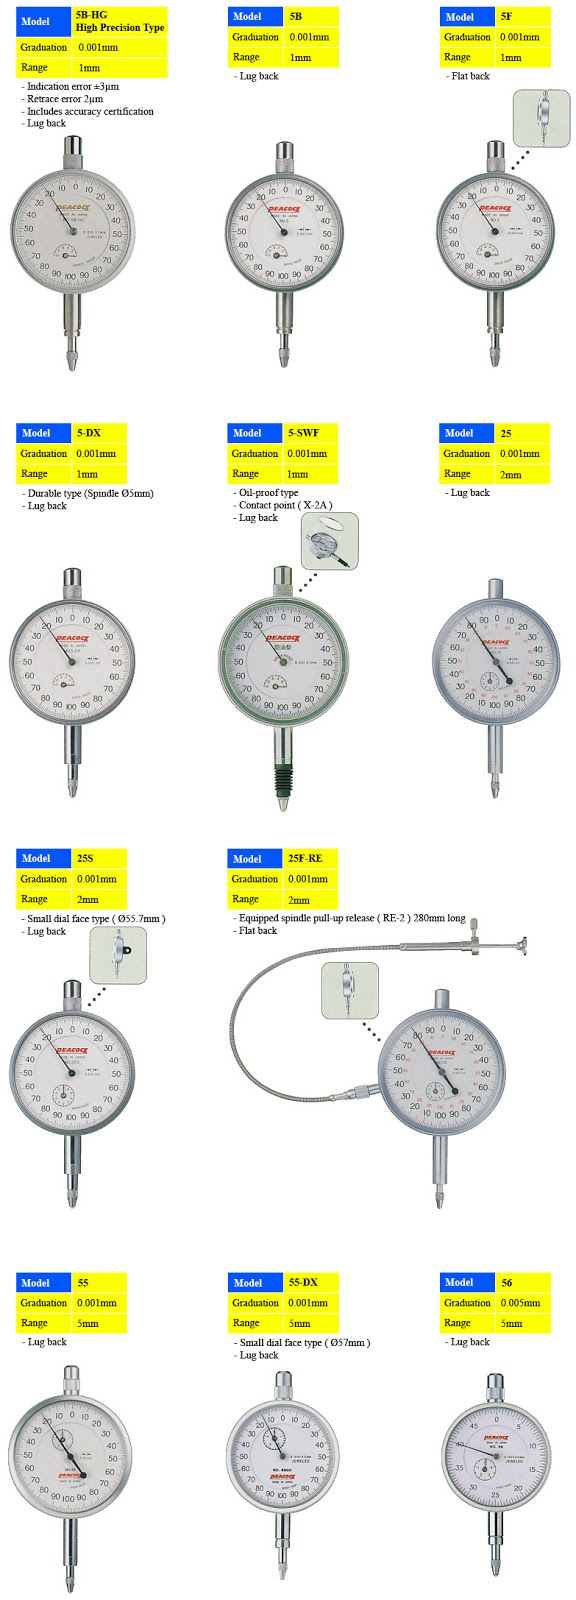 Jual Peacock Standard Dial Gauges 0.001mm, 0.005mm Type